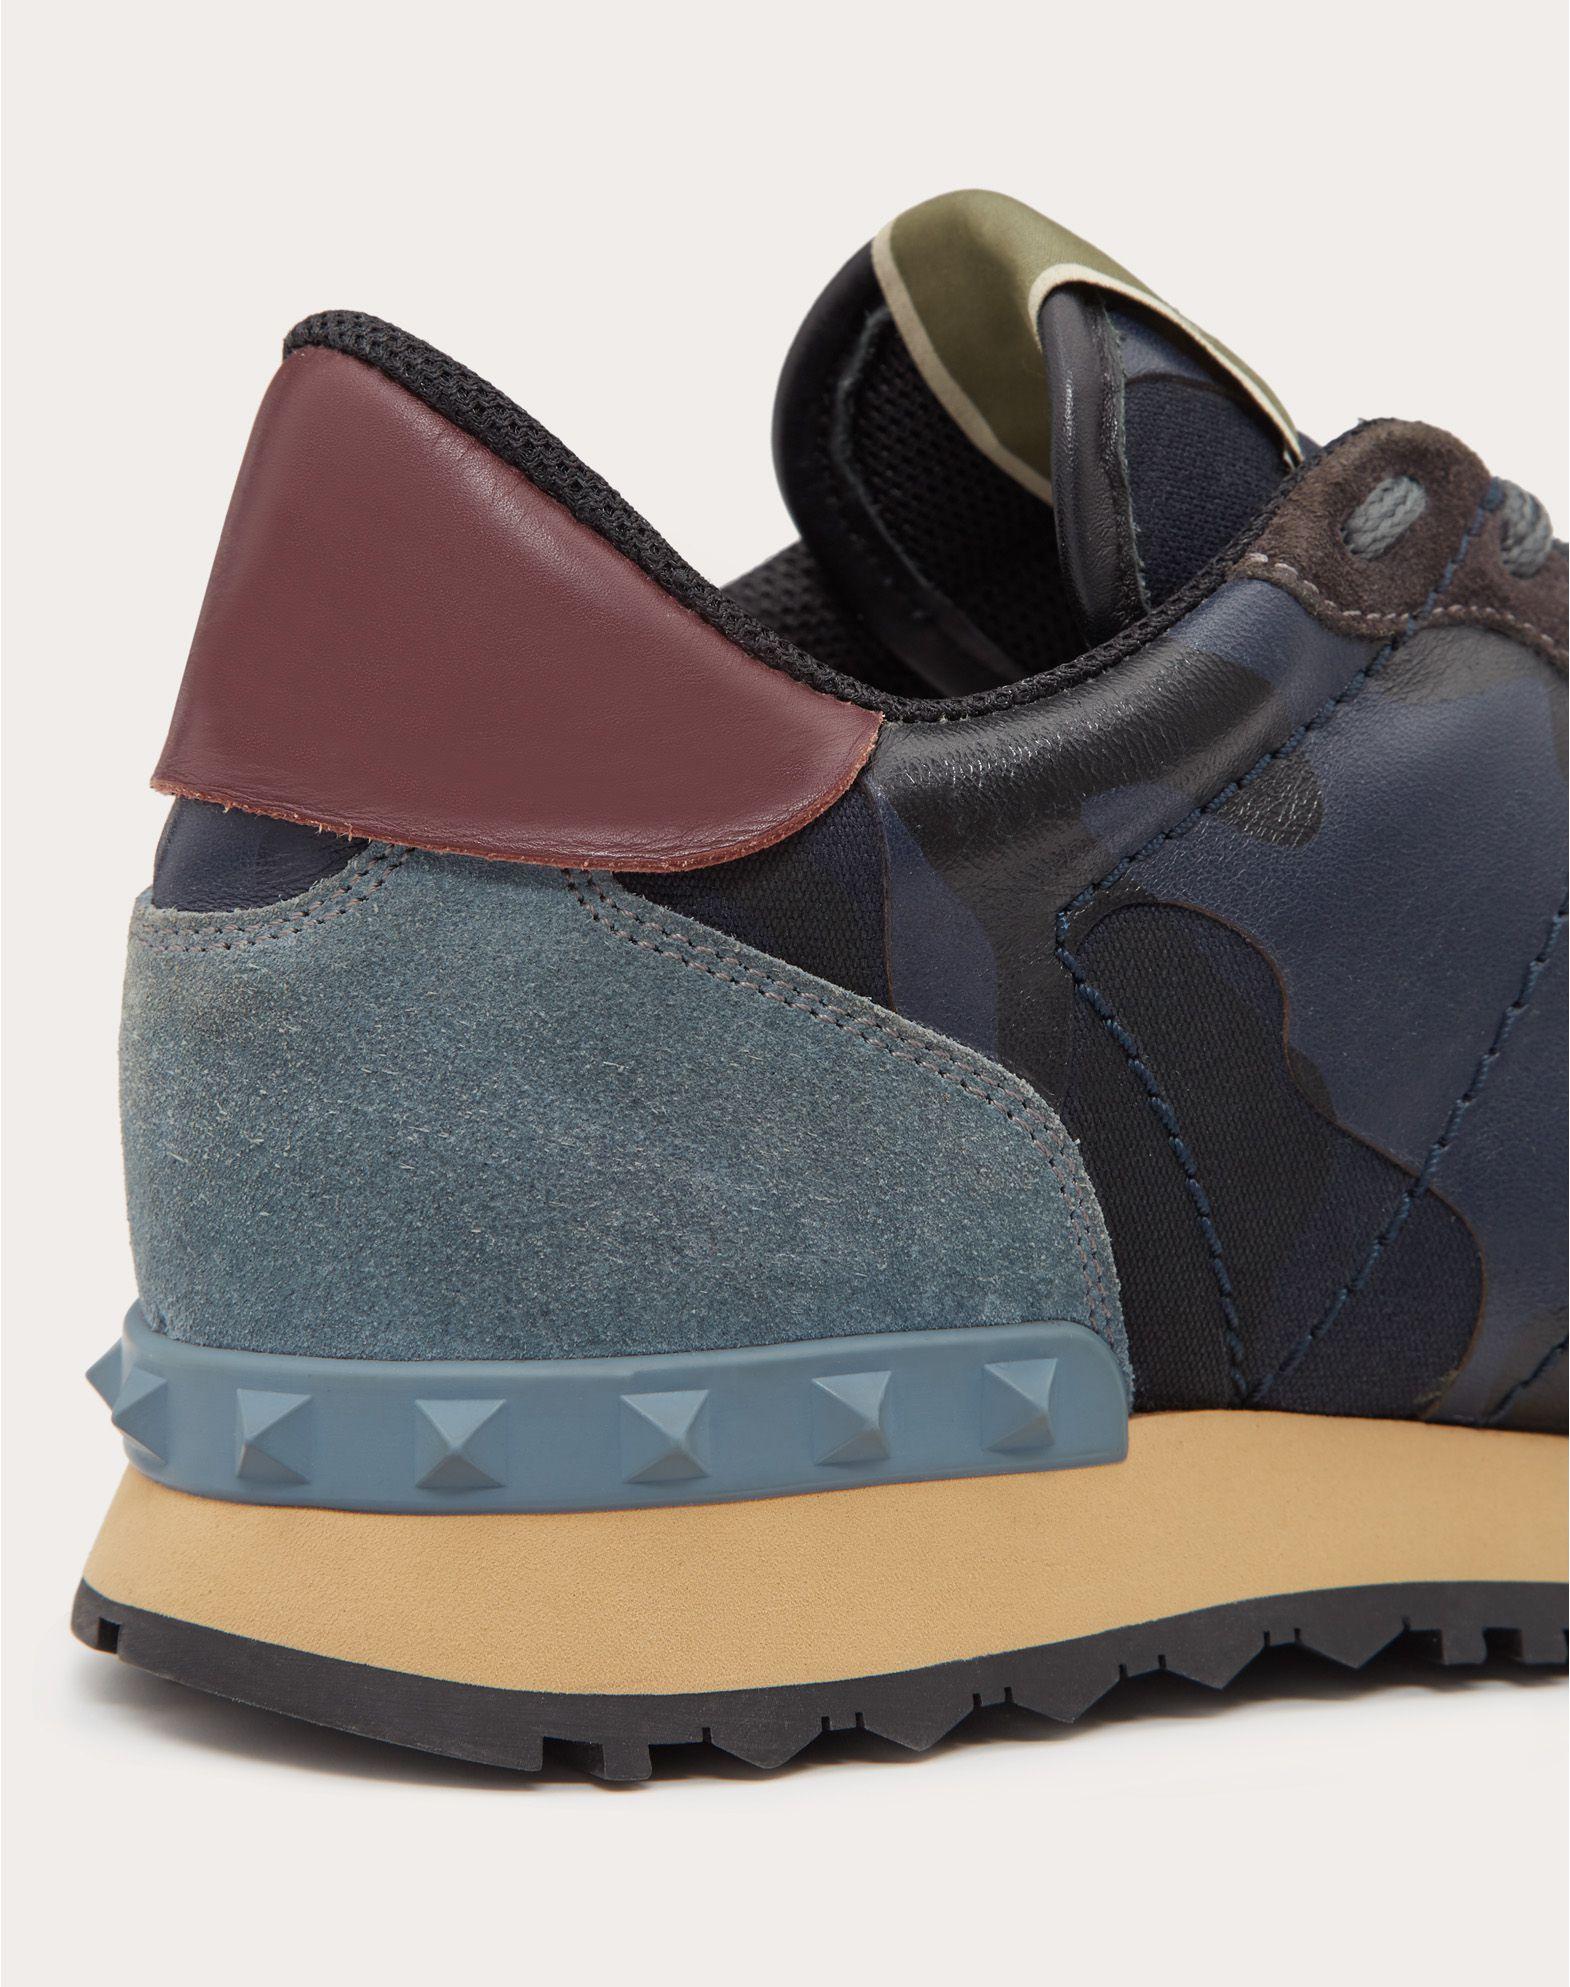 VALENTINO GARAVANI UOMO Camouflage Rockrunner Sneaker LOW-TOP SNEAKERS U a